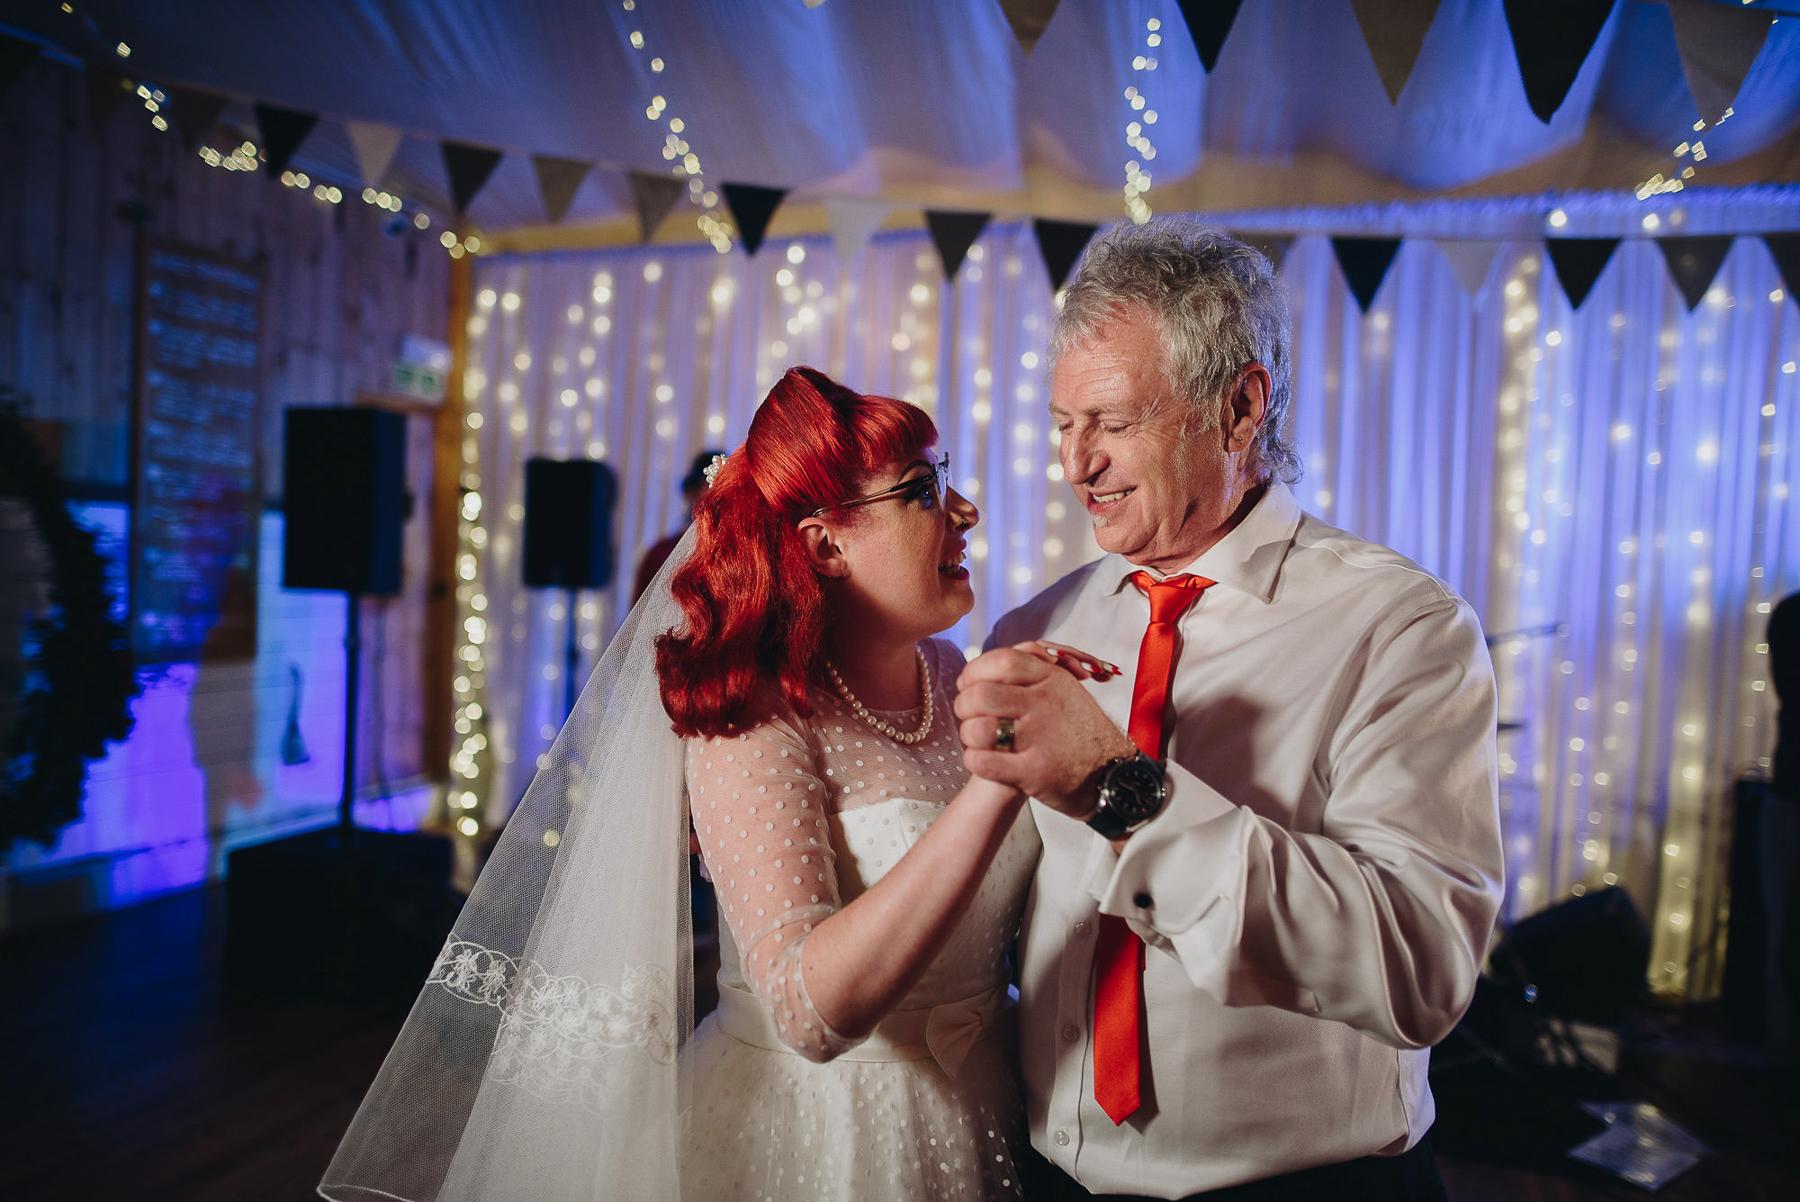 Wellbeing_Farm_Wedding_Photography_The_Pin-Up_Bride_Lara_Shaun-151.jpg